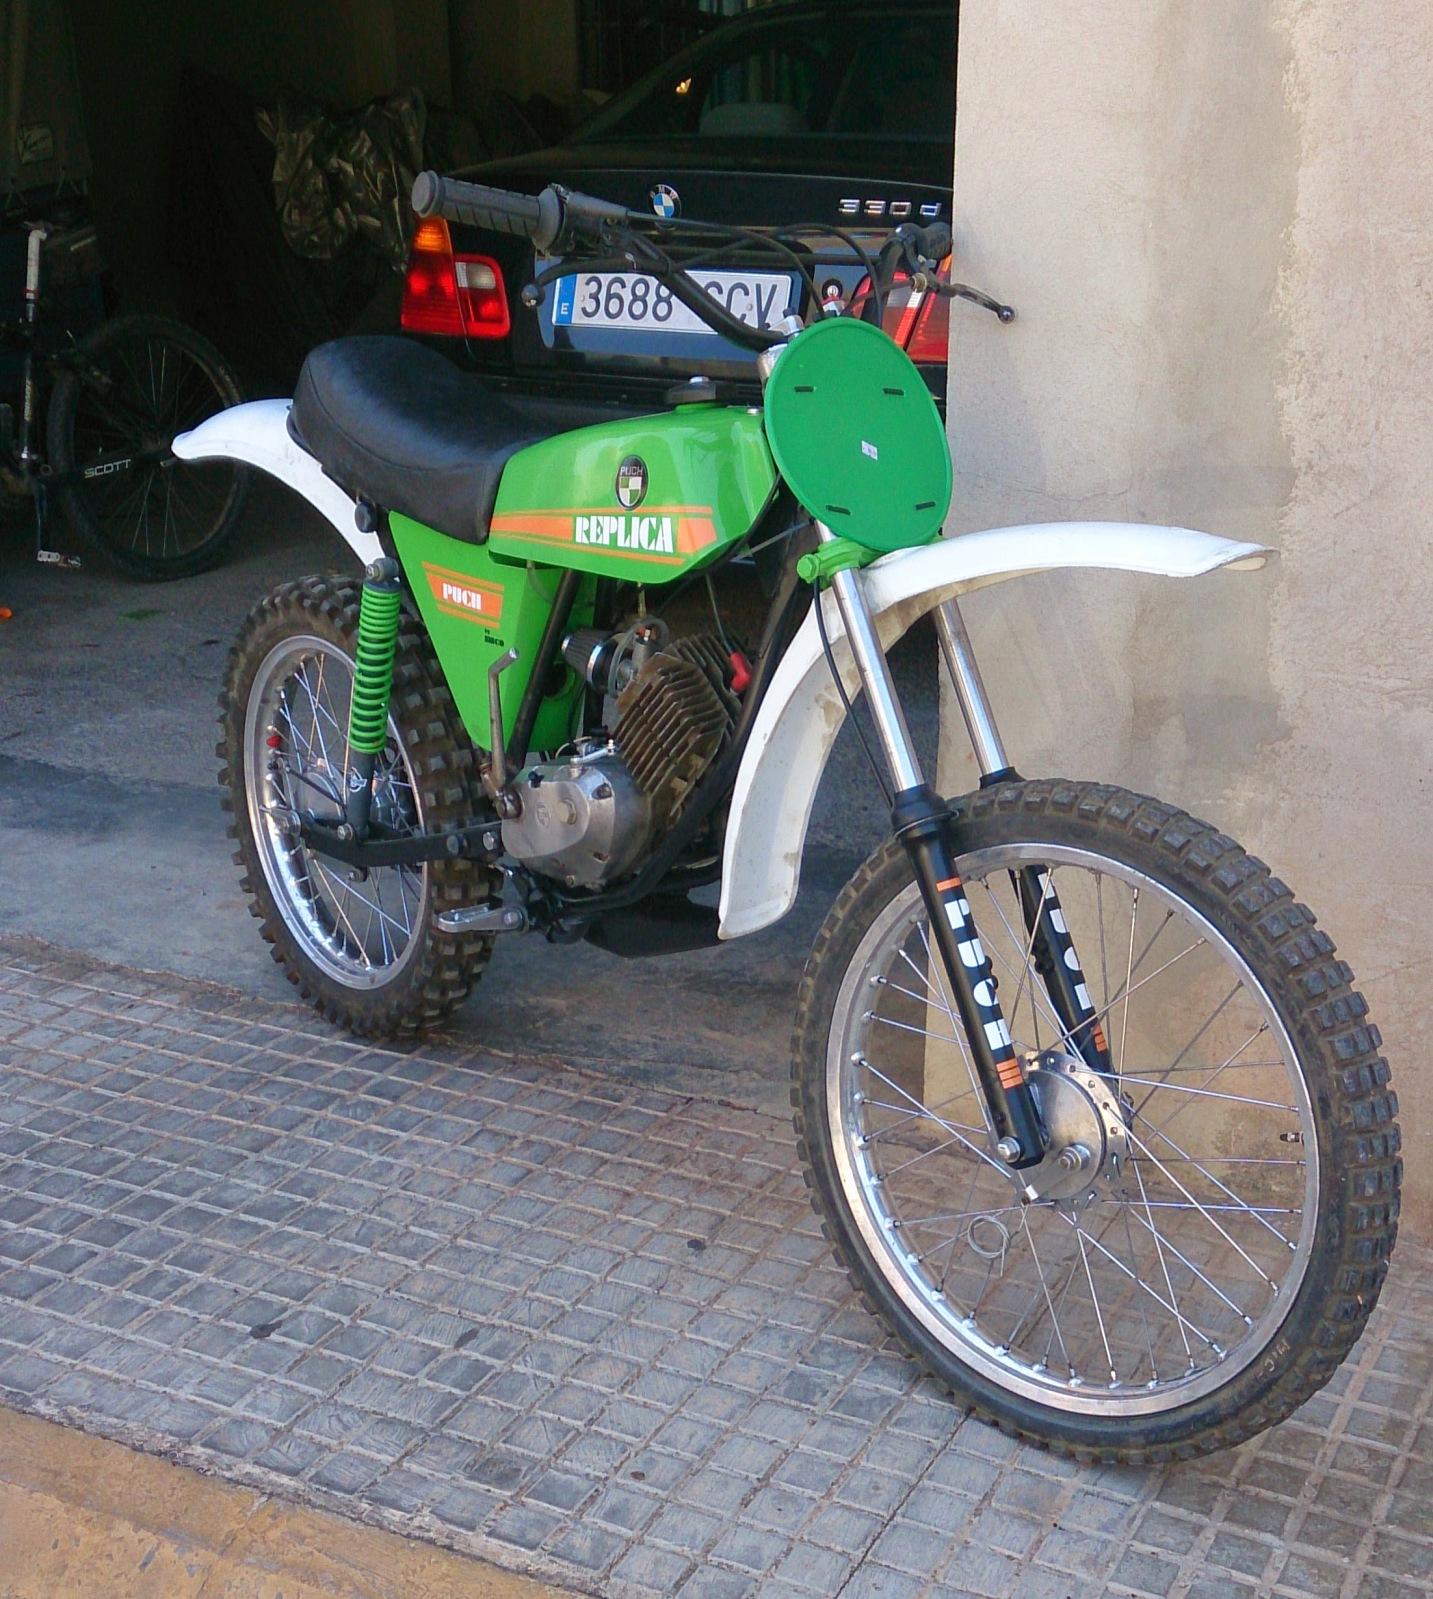 Puch Minicross Super con preparacion Cobra - Página 3 Jij0wj